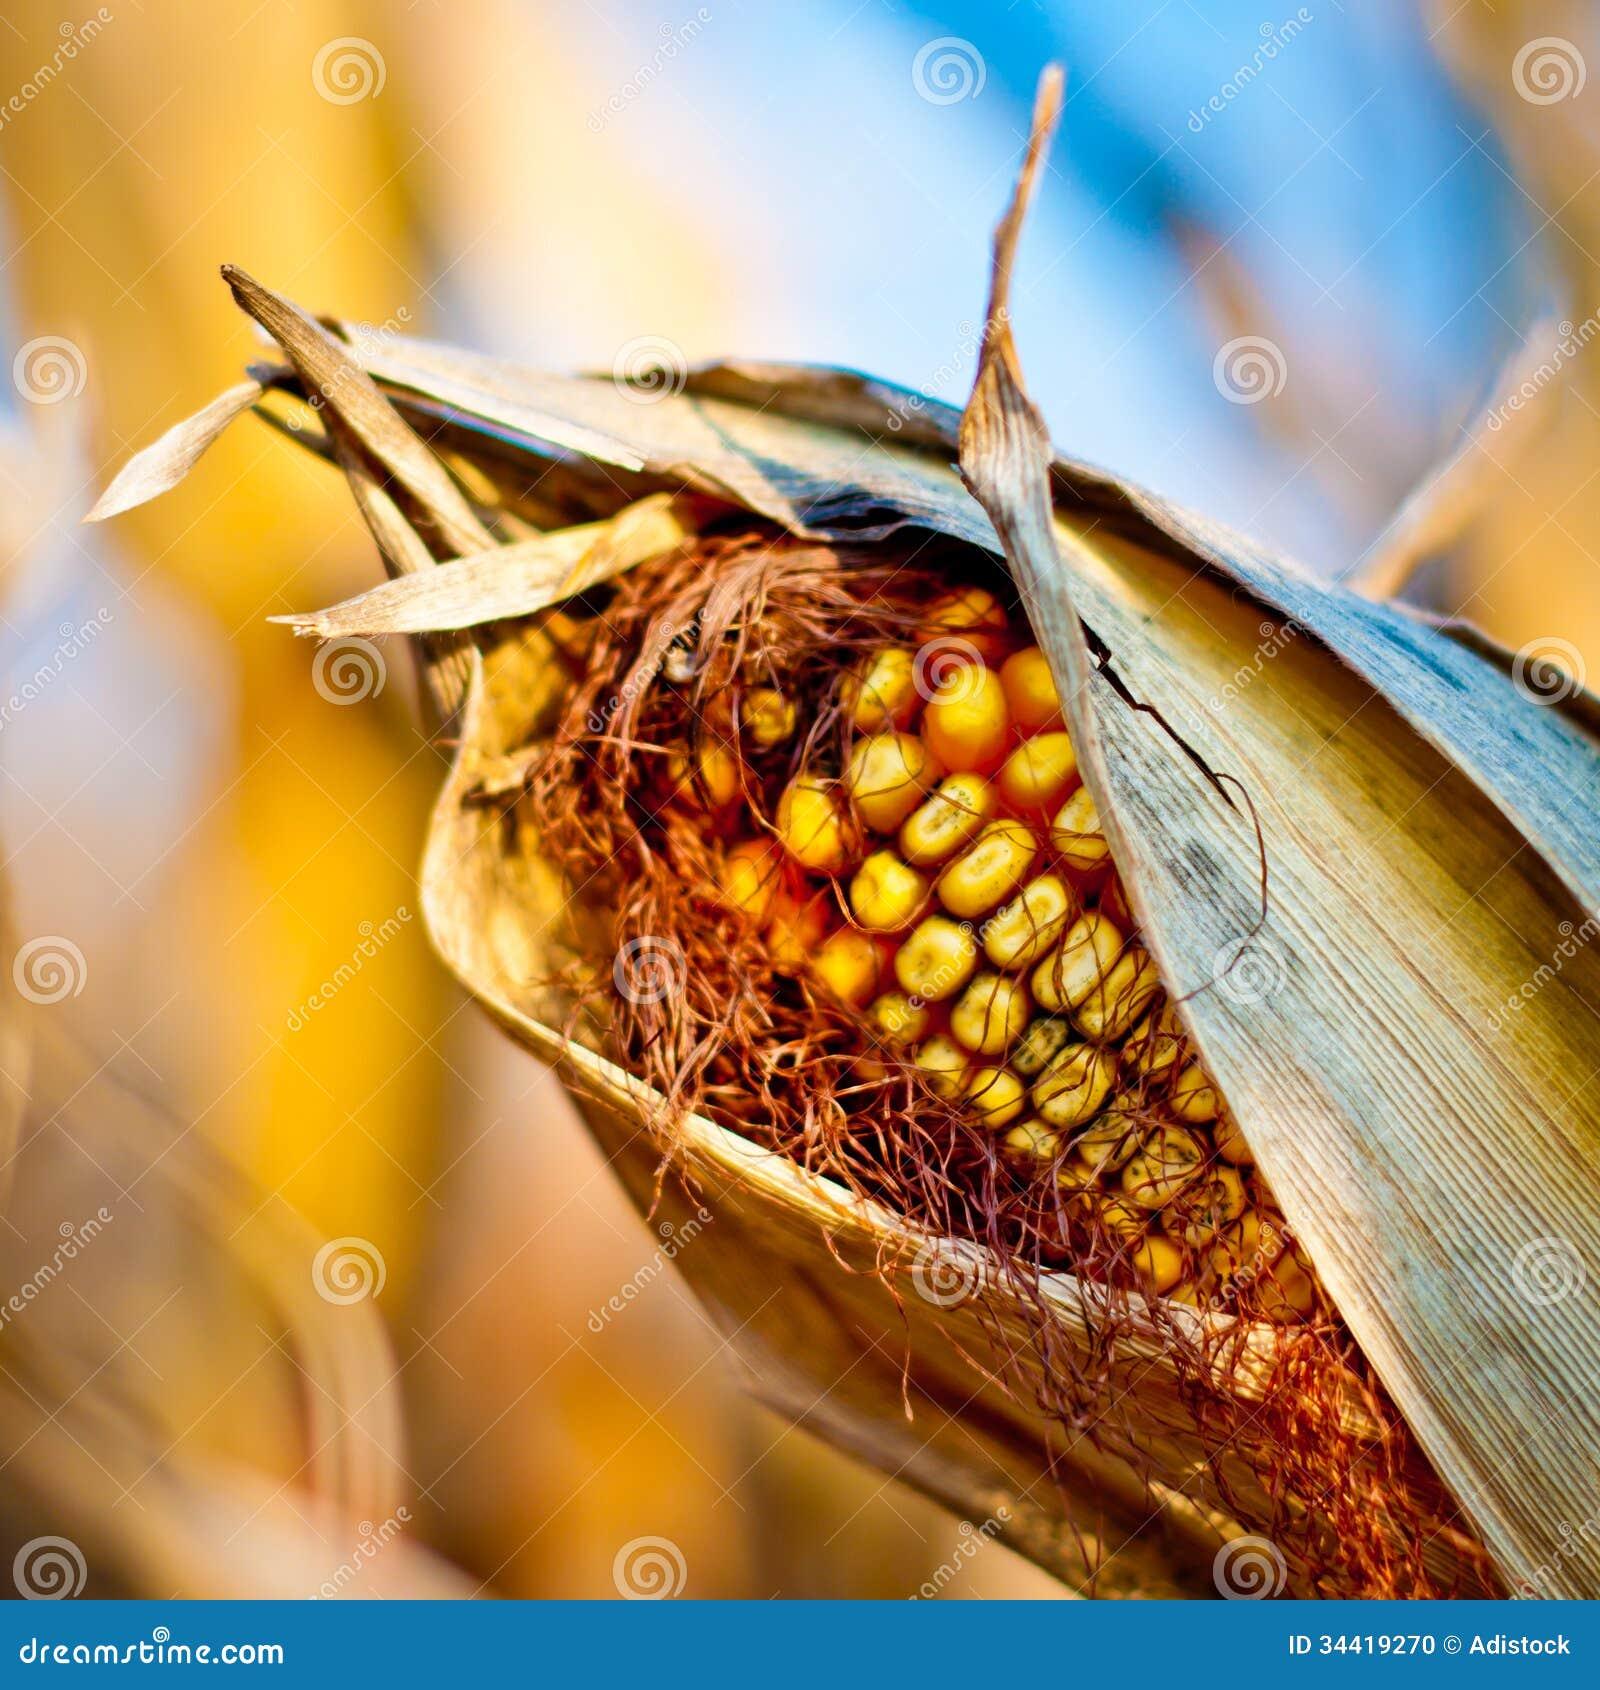 Maisnahaufnahme auf dem Stiel